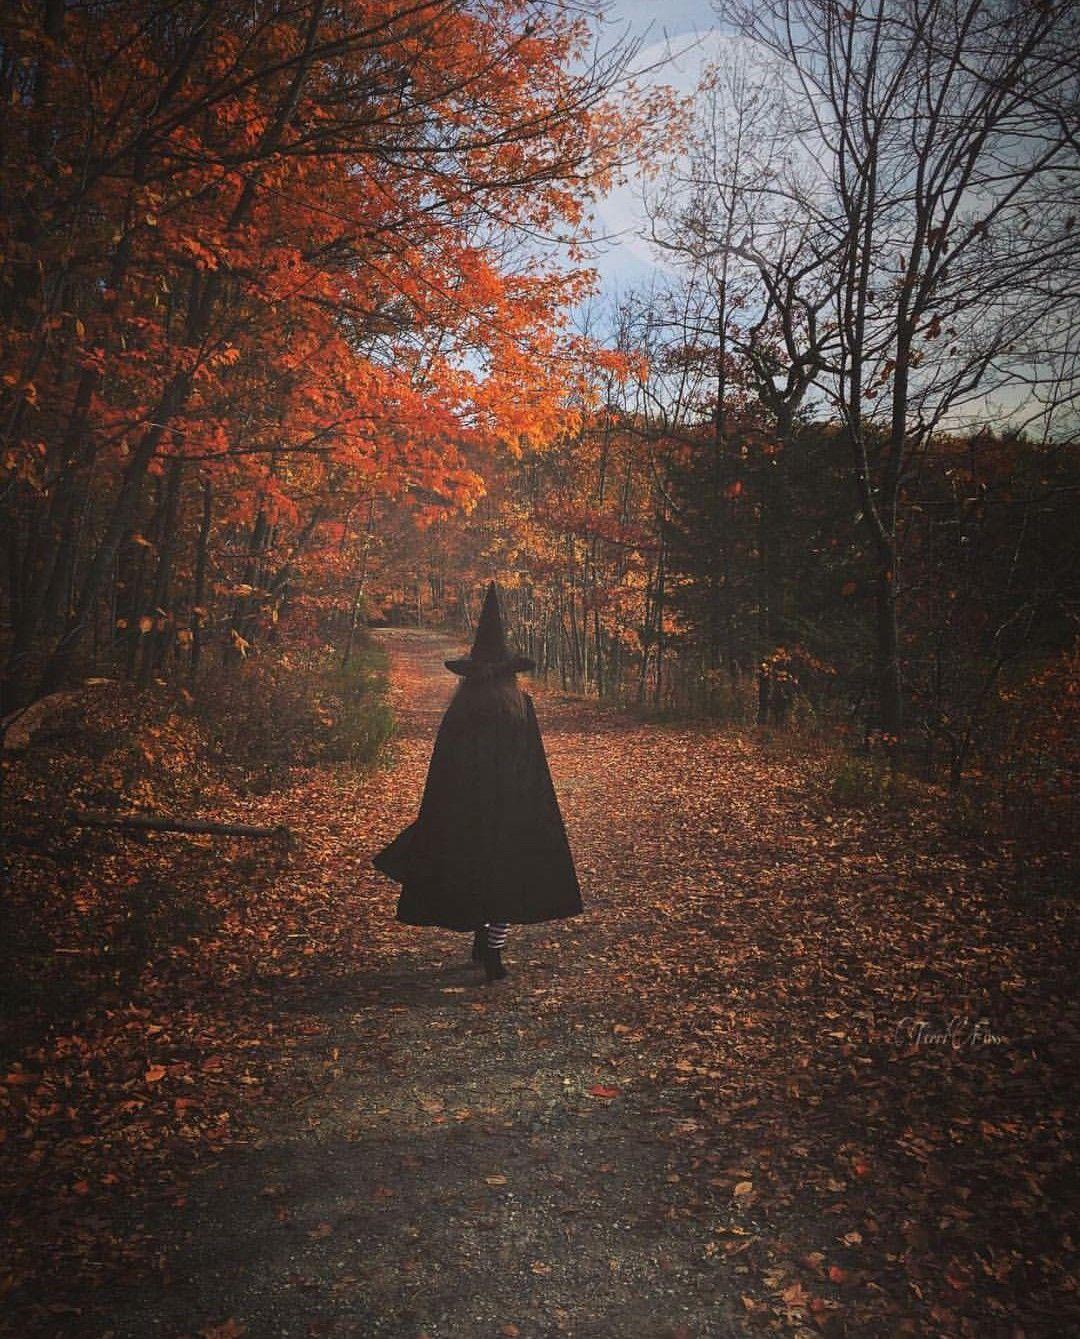 Halloween Chiesa.Pin By Shauna Chiesa On Random Inspo Halloween Autumn Aesthetic